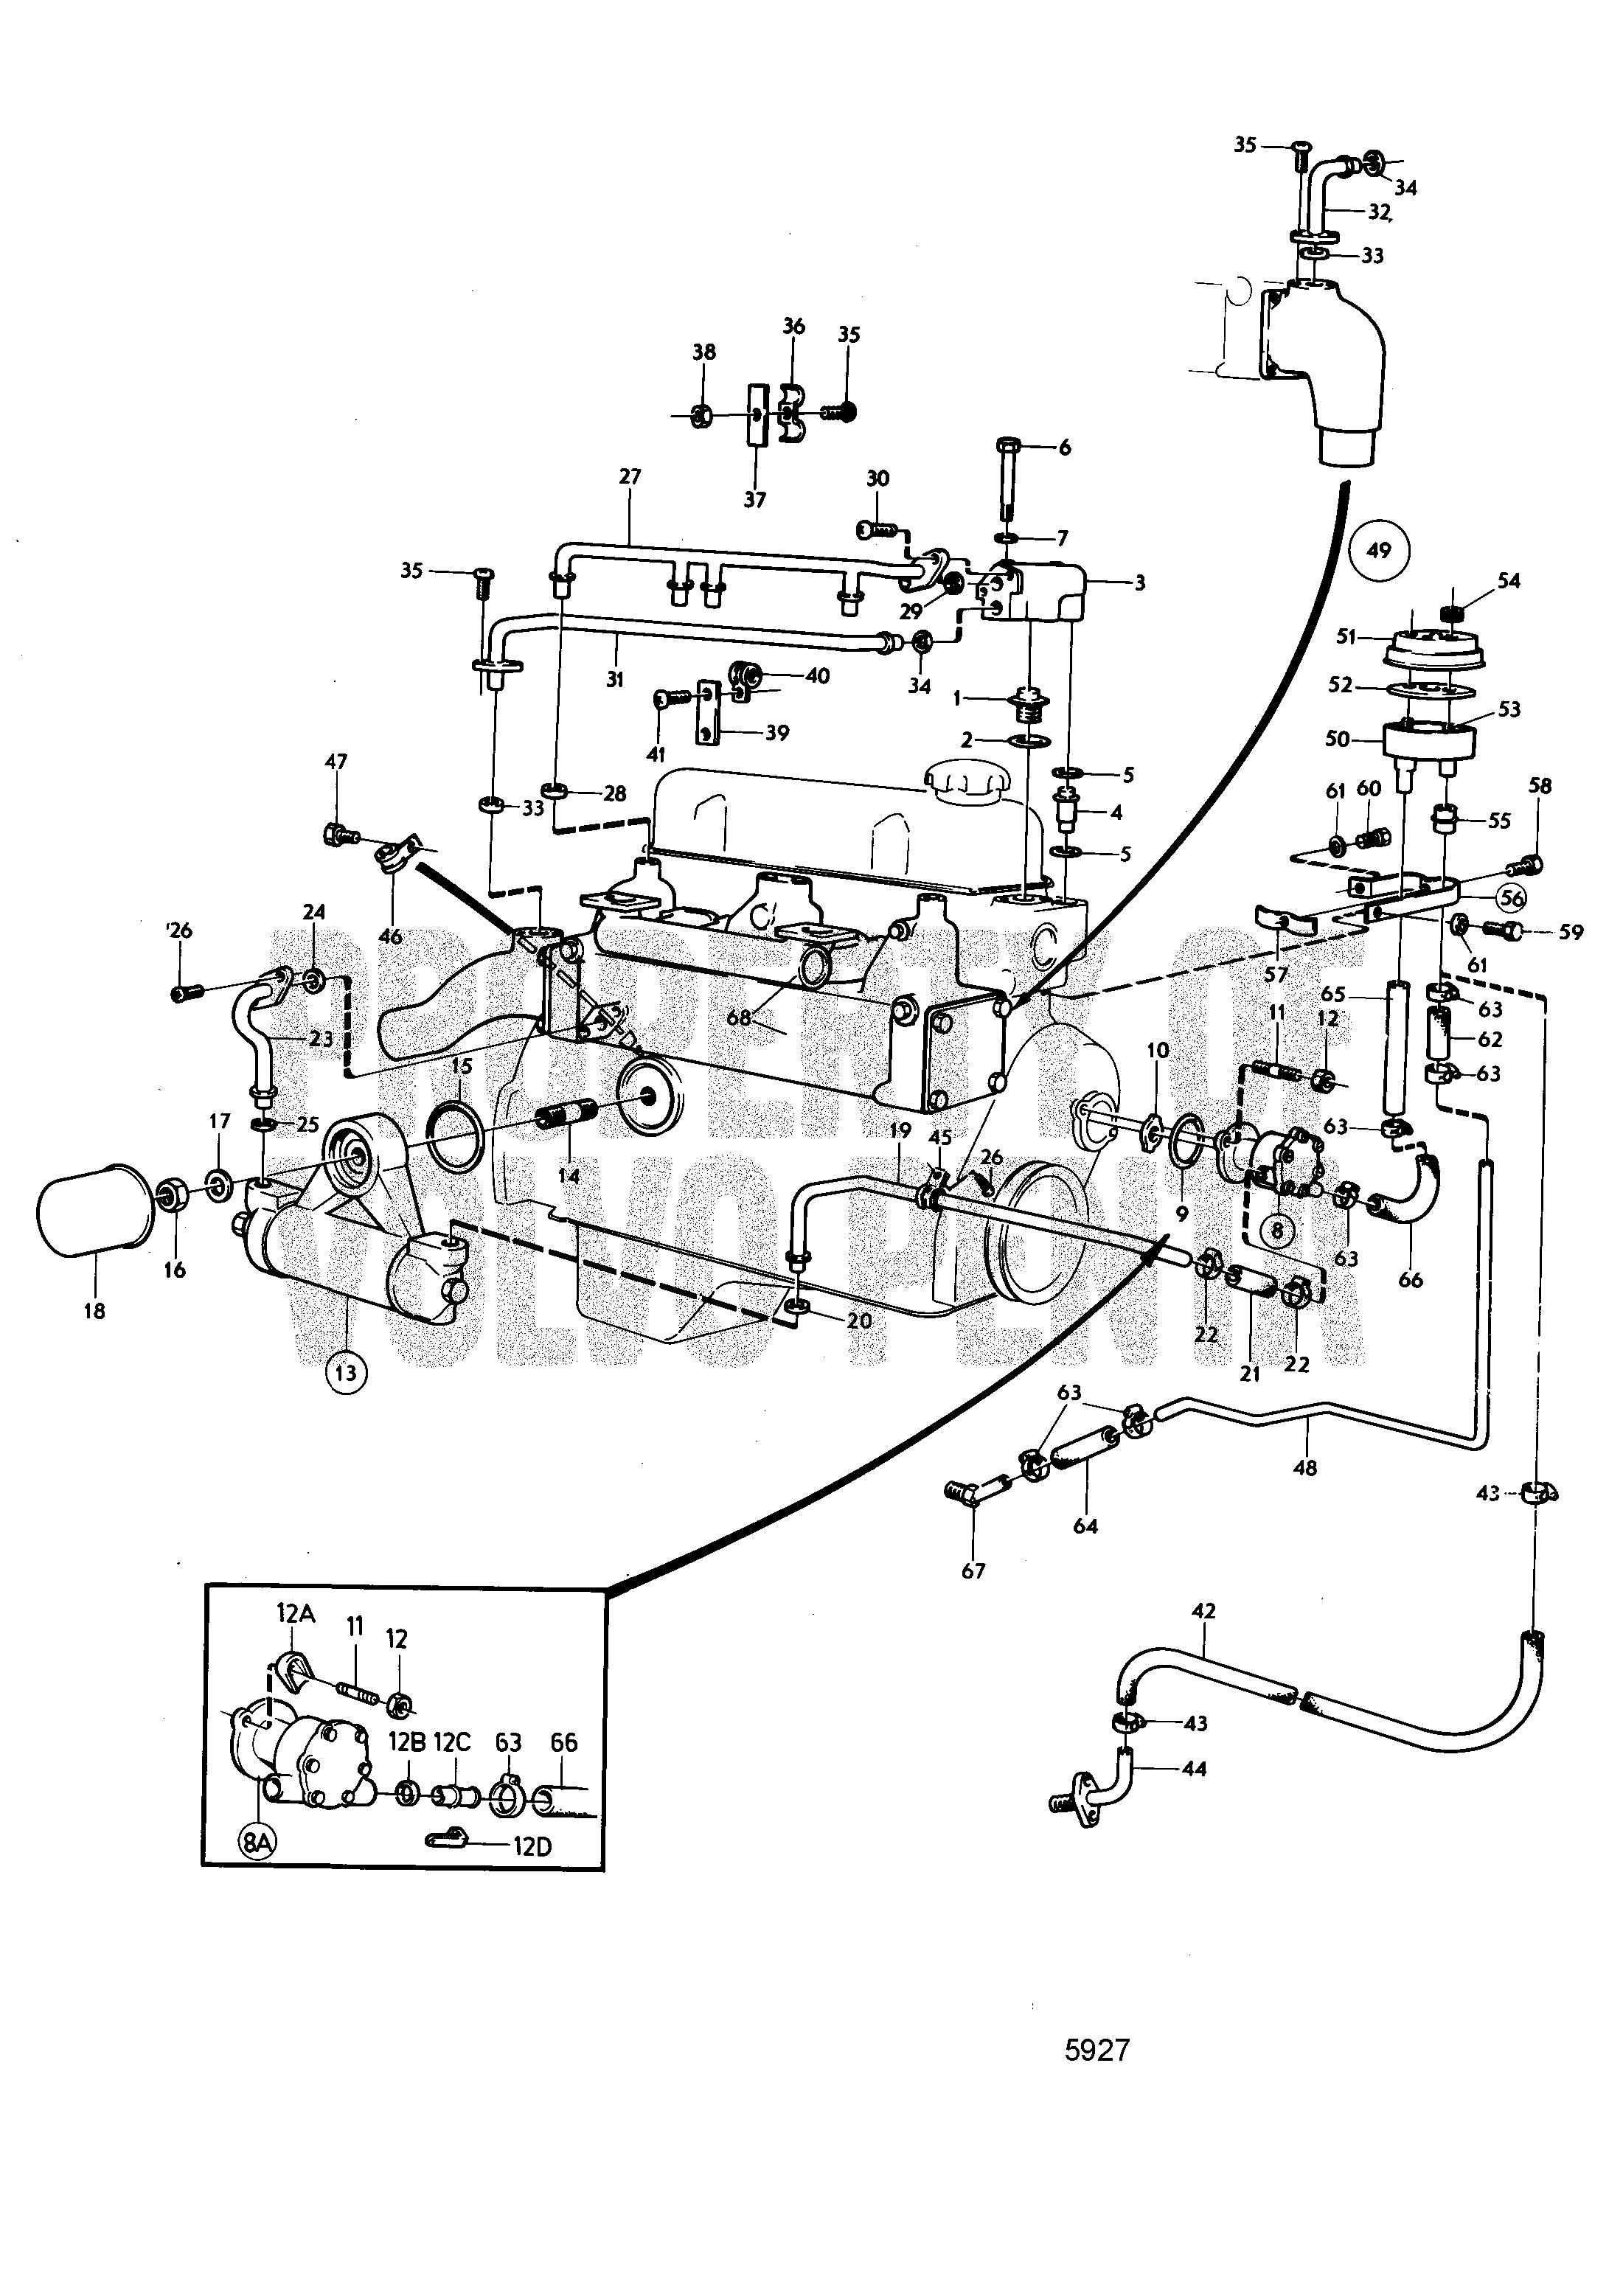 volvo marine gasoline engines aq115a aq115b aq130 aq130a rh vansoutboardparts com Ford Workshop Manuals Otawwa Workshop Manuals